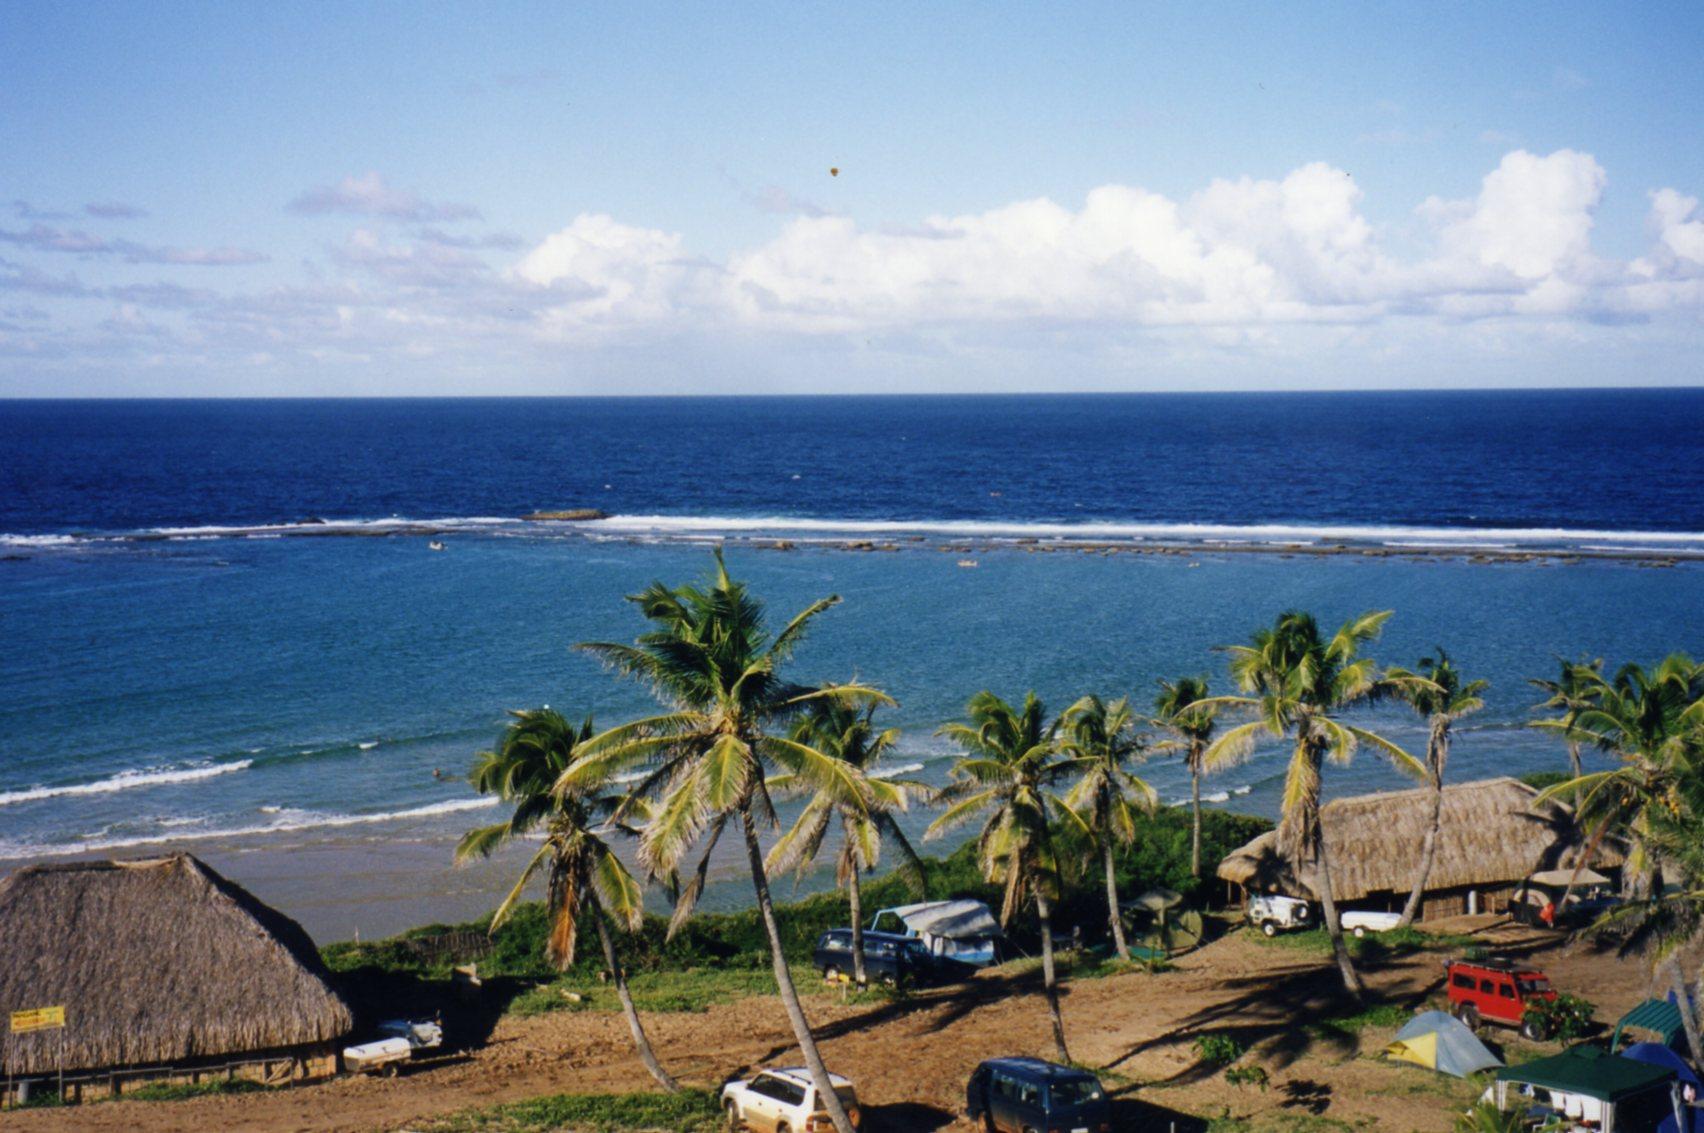 Reef at Paindane creating a sheltered bay